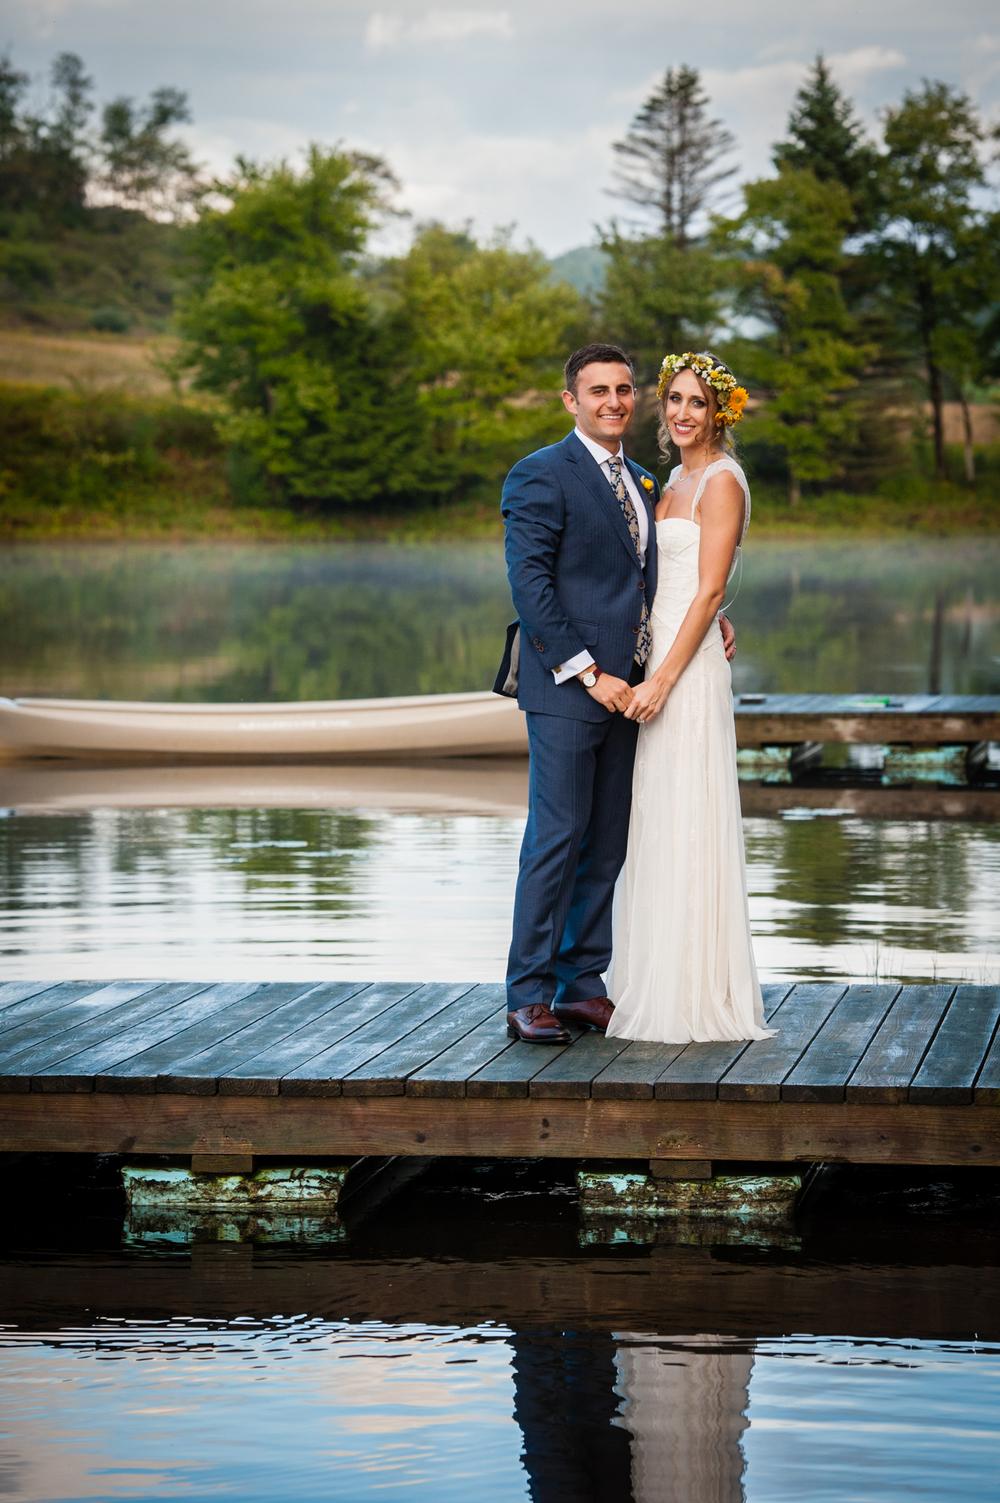 Rochester Wedding Photography 058.jpg